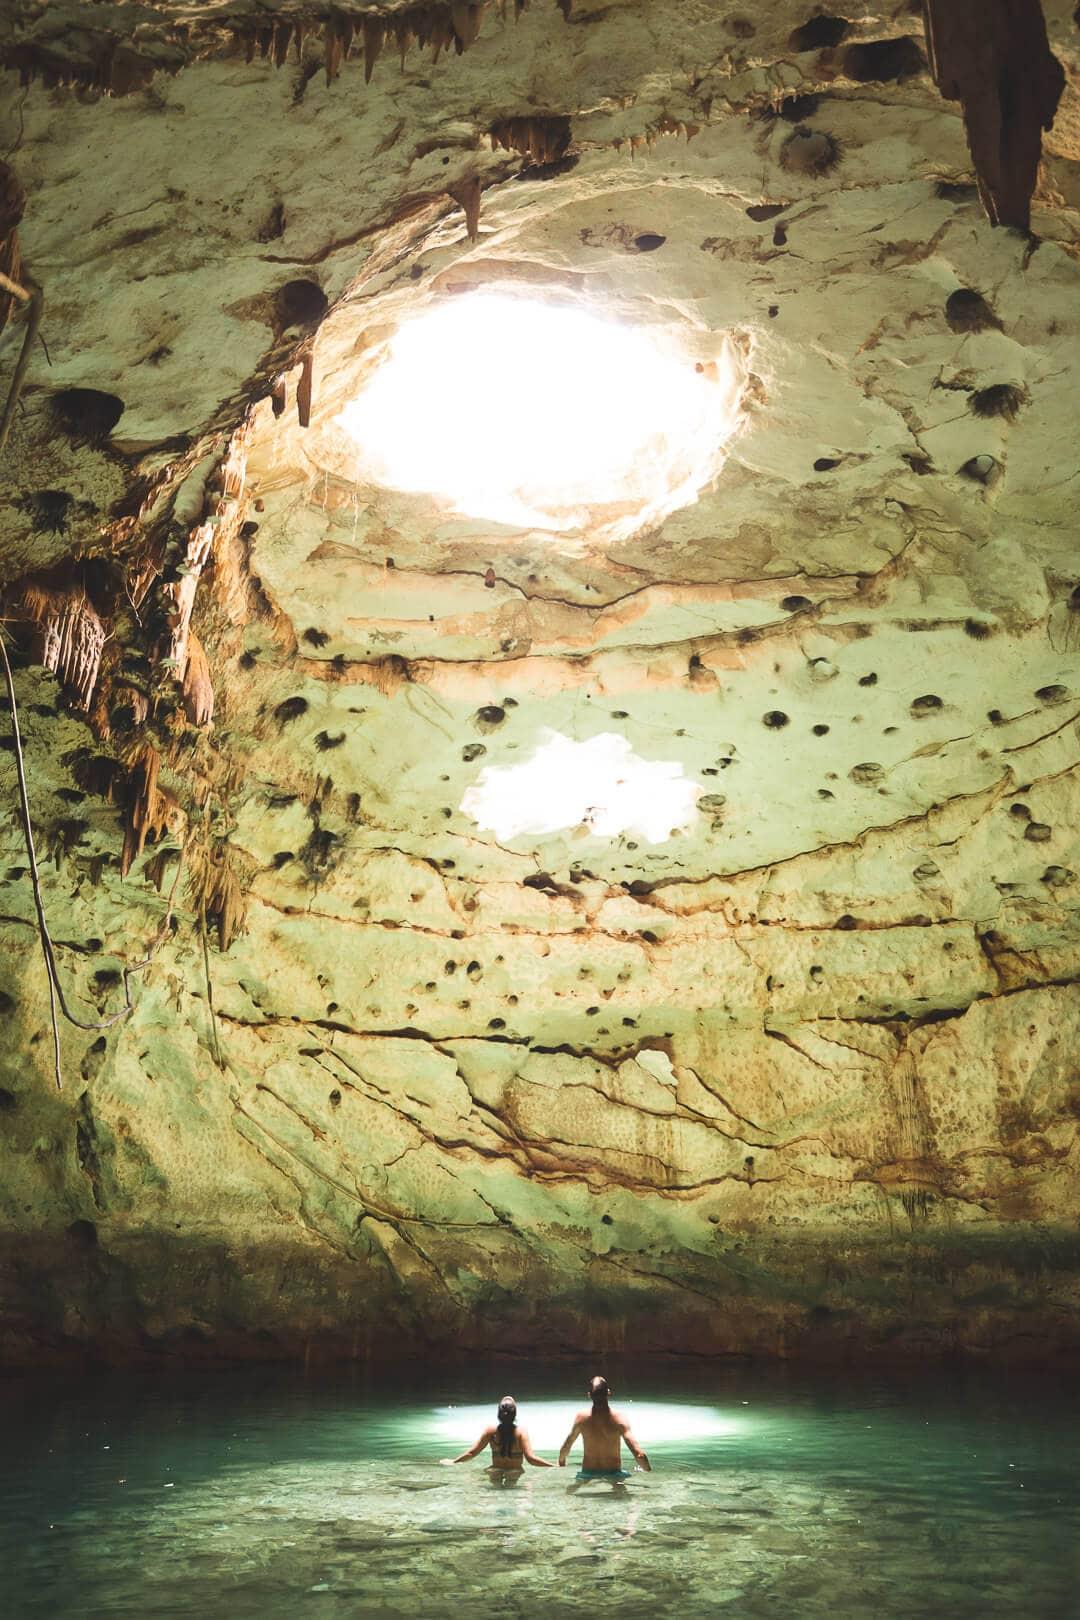 Matt and Sindhya stand inside Hool Kosom cenote